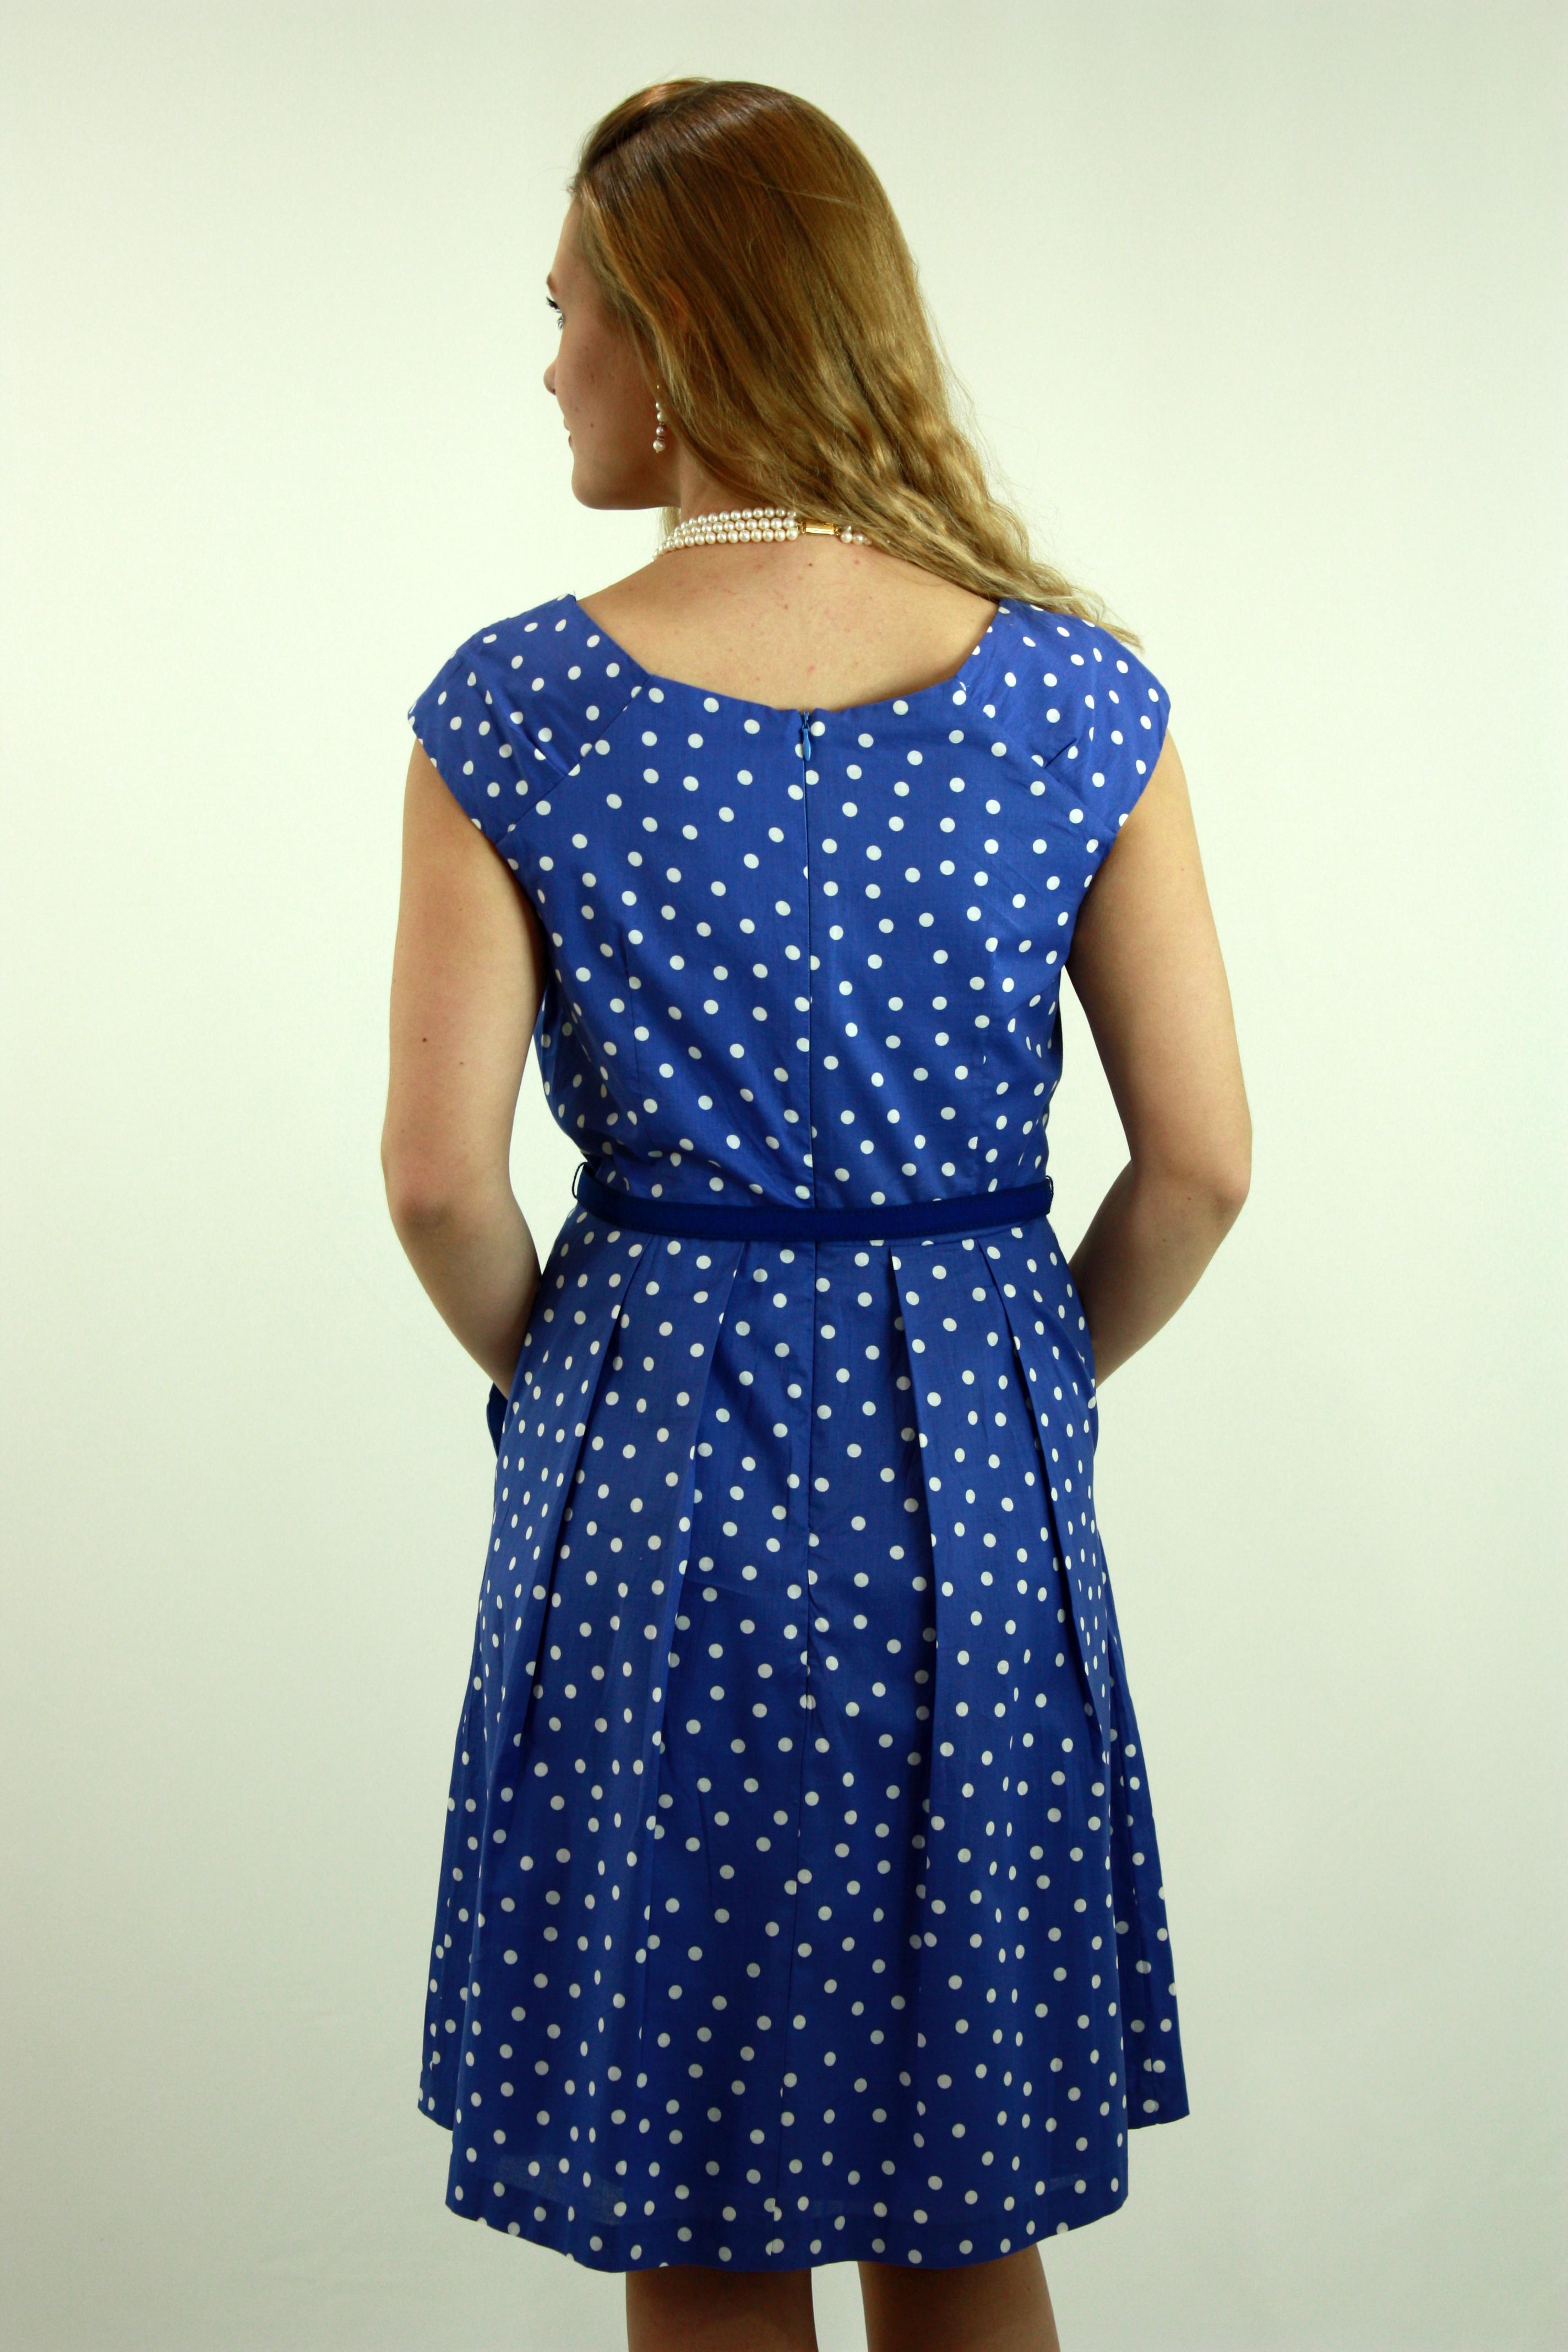 Polka dot blue dress